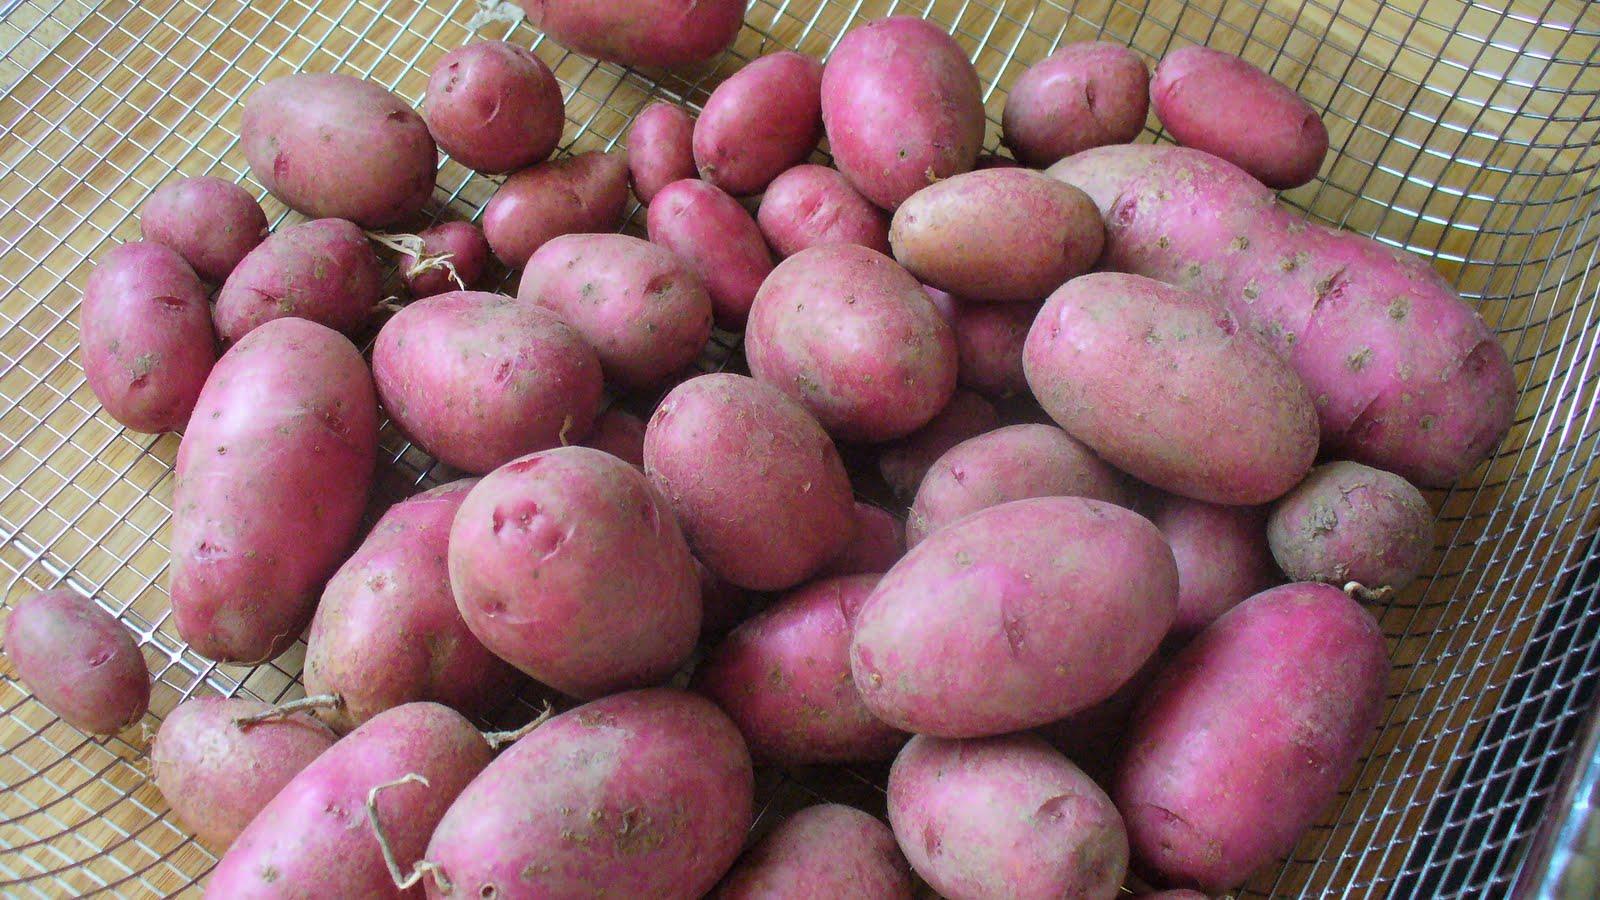 Grilled Garlic Rosemary Red Potatoes - Family Balance Sheet